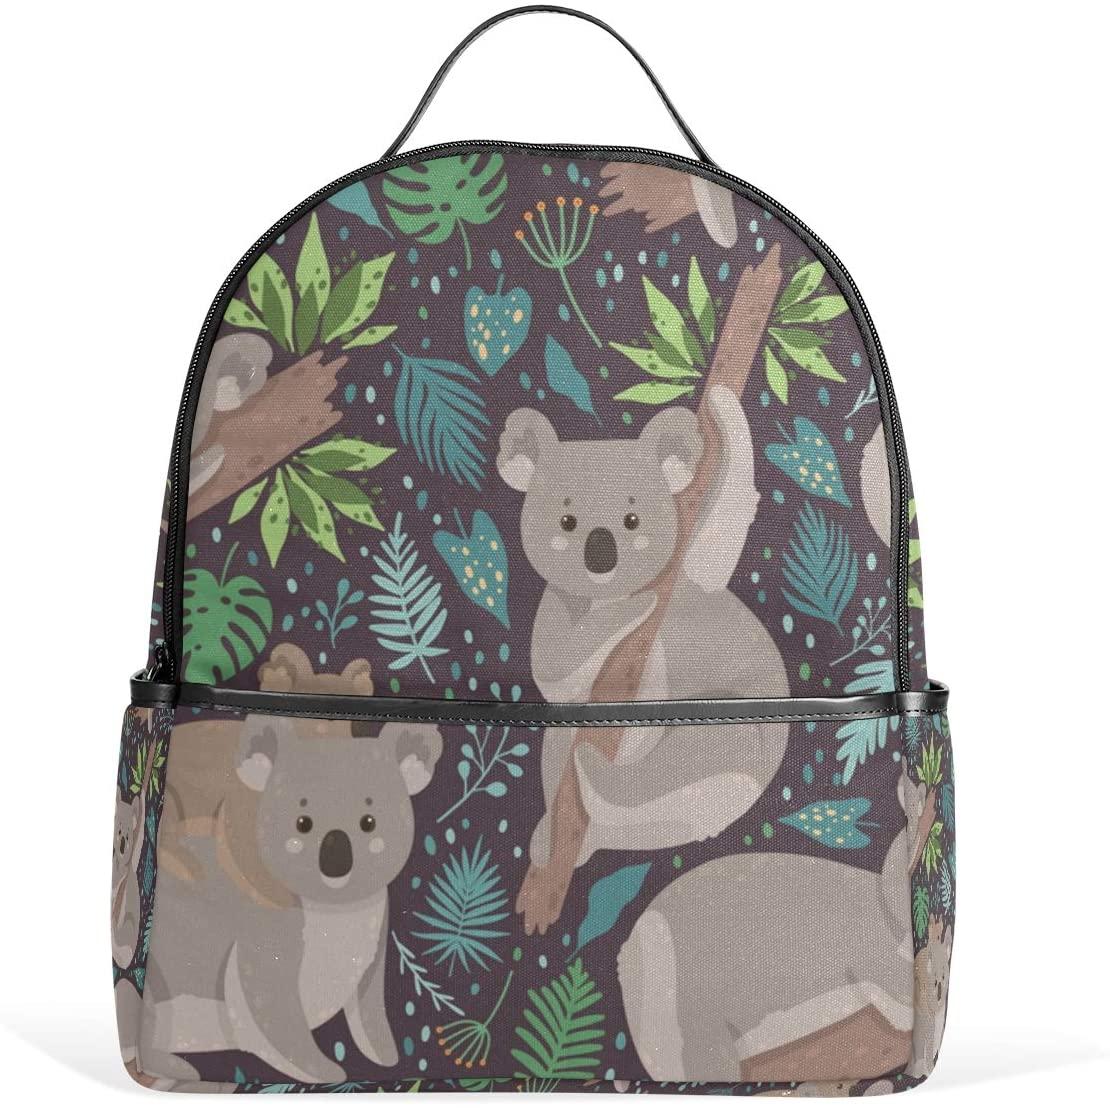 OREZI Cute Koala Surrounded By Tropical Leaves Schoolbag Bookbag Casual Rucksack Backpack for Girls Boys Kid's